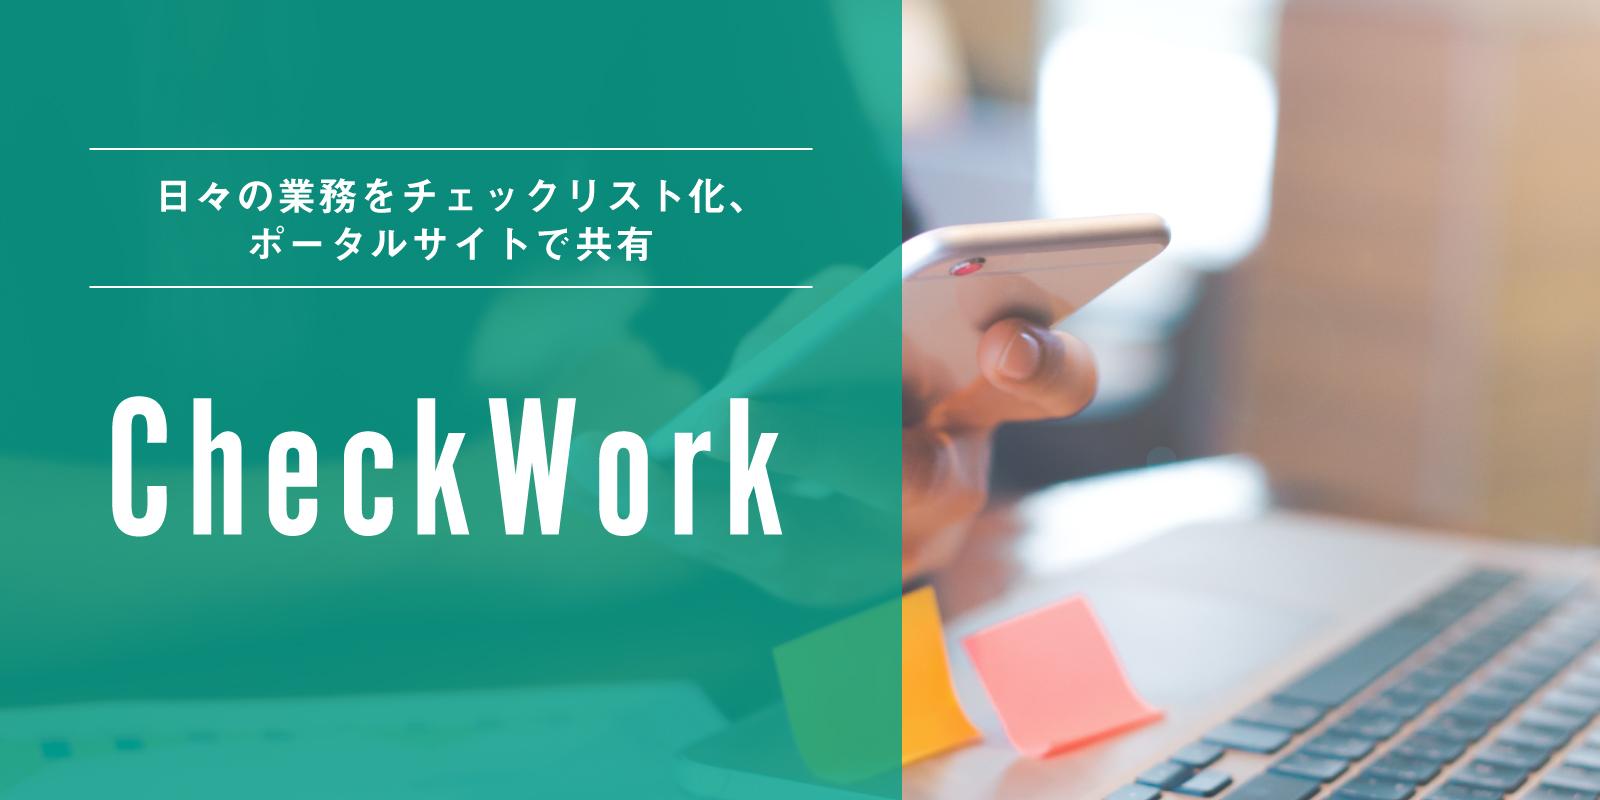 CheckWork(チェックワーク)